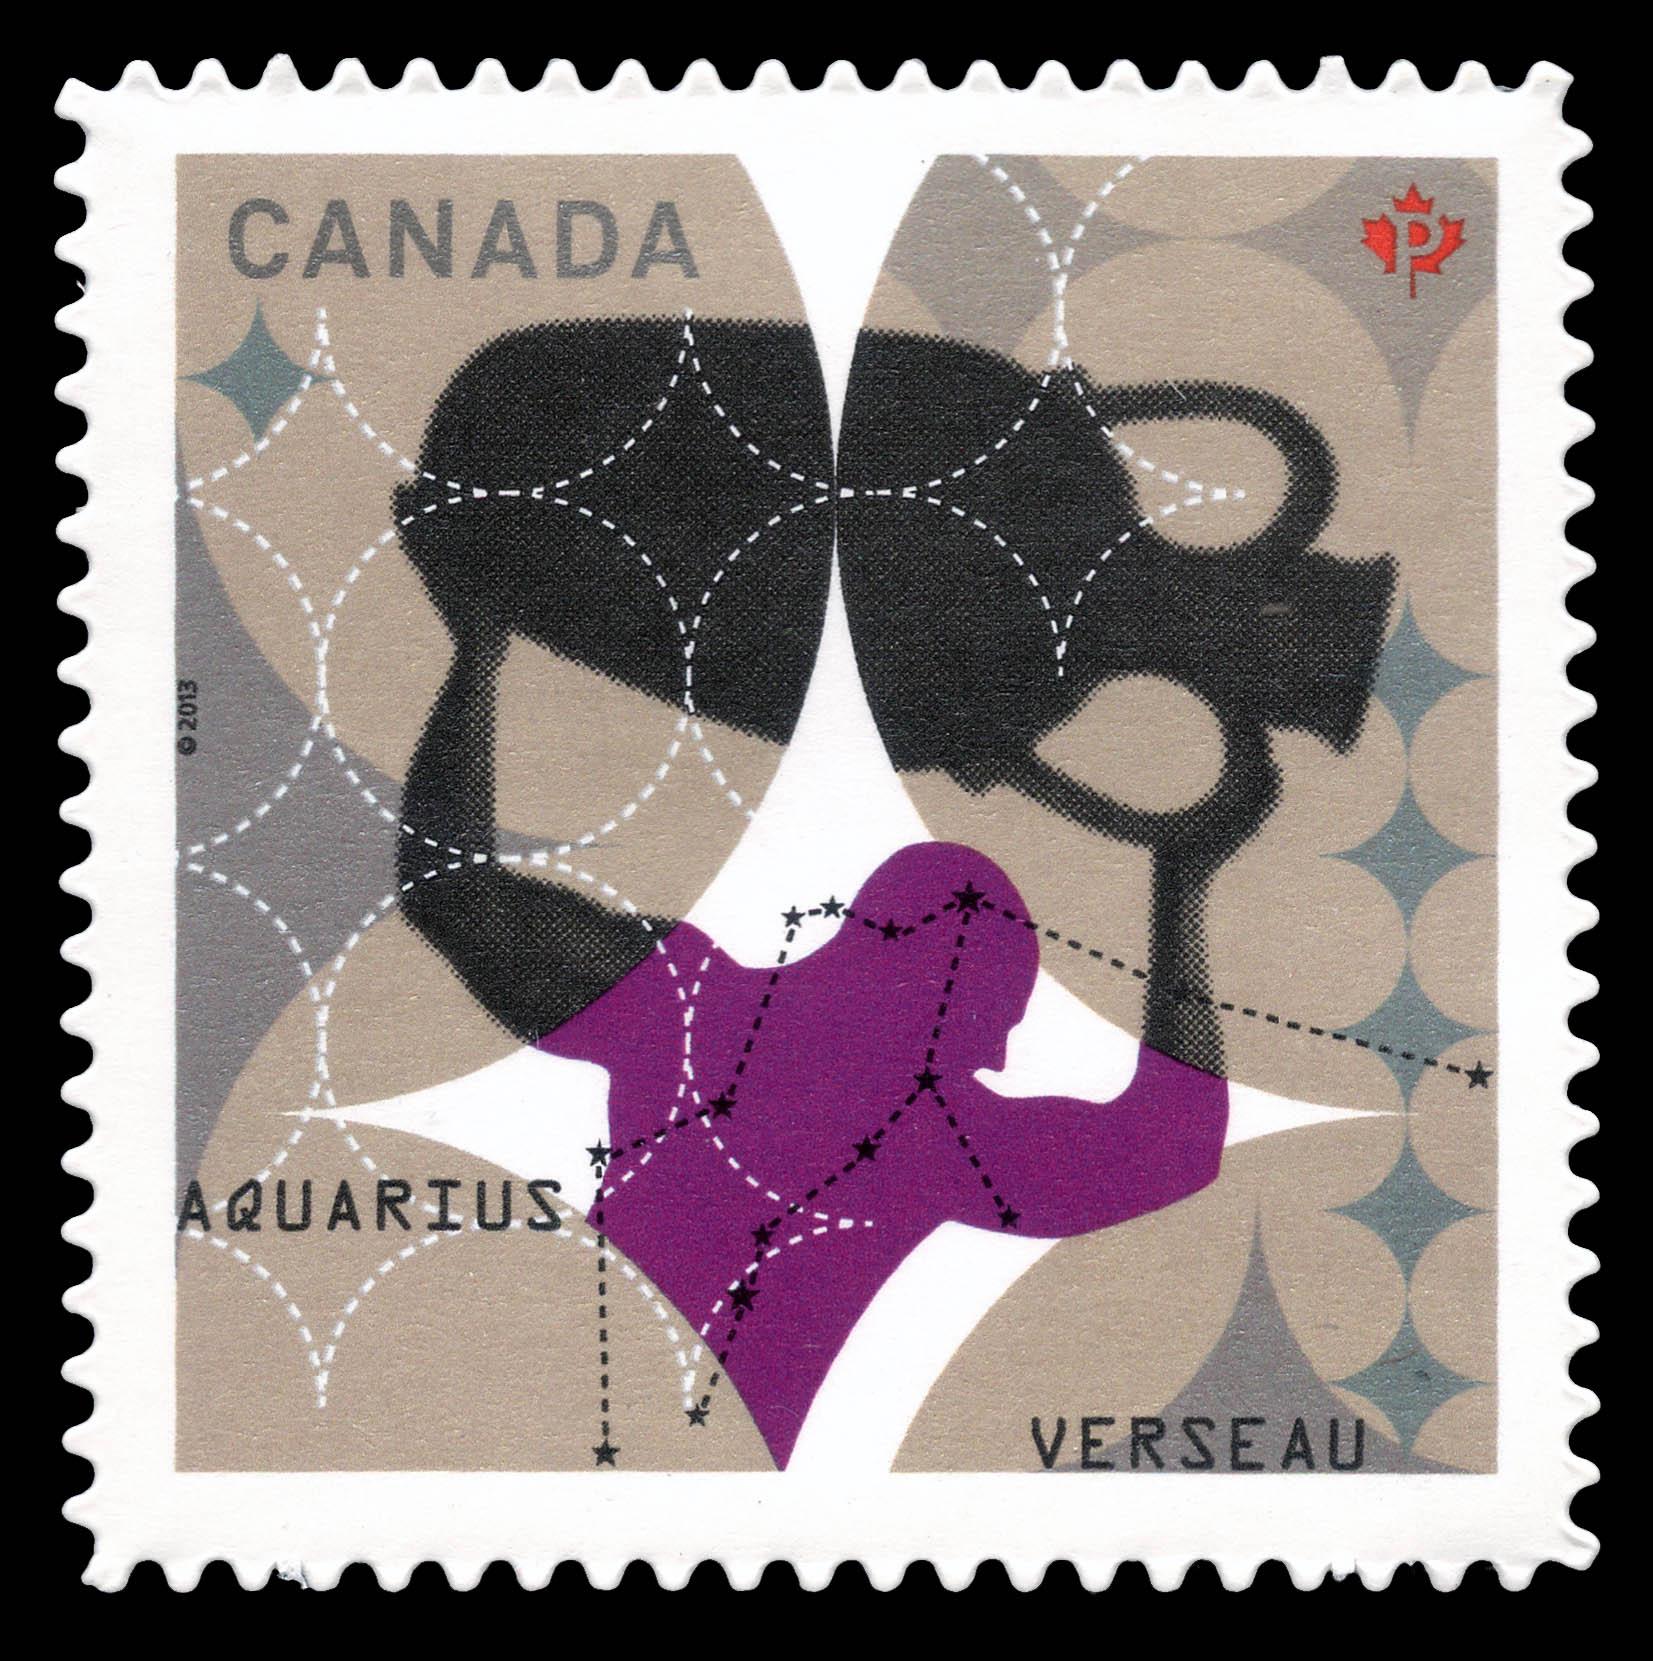 Signs of the Zodiac: Aquarius Canada Postage Stamp | Signs of the Zodiac